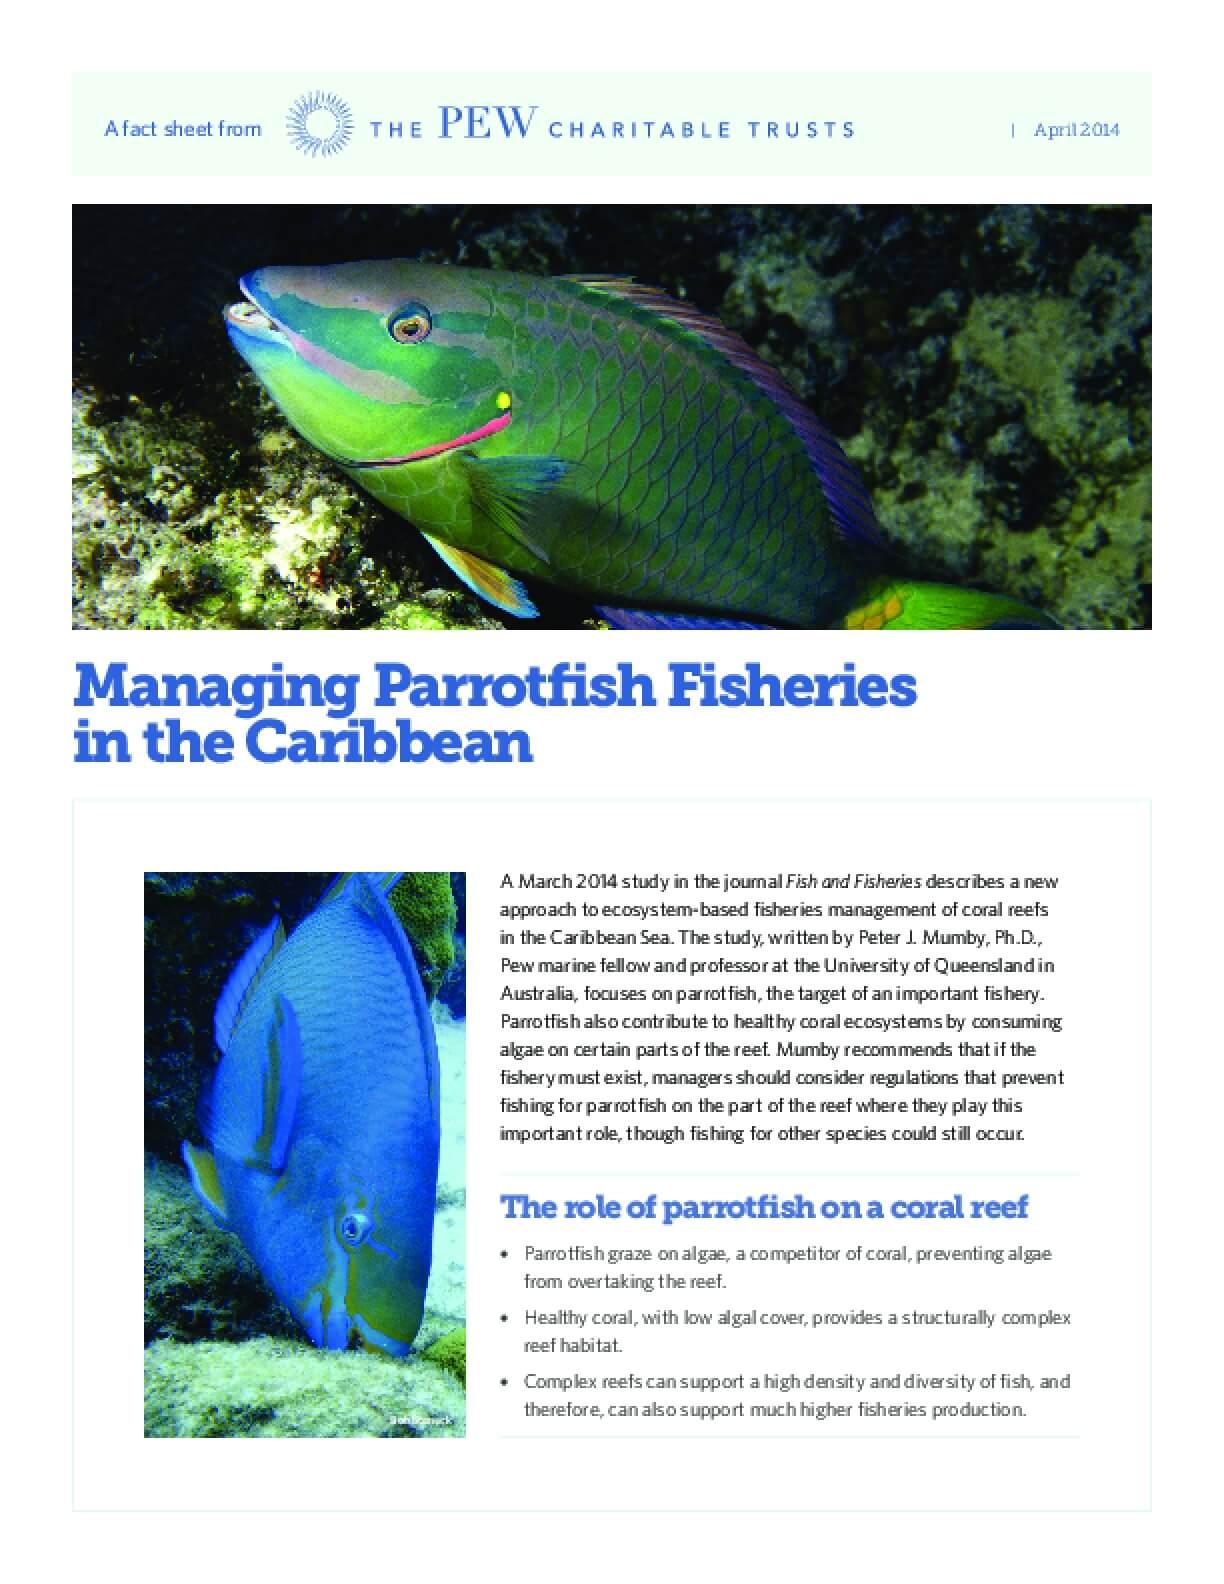 Managing Parrotfish Fisheries in the Caribbean